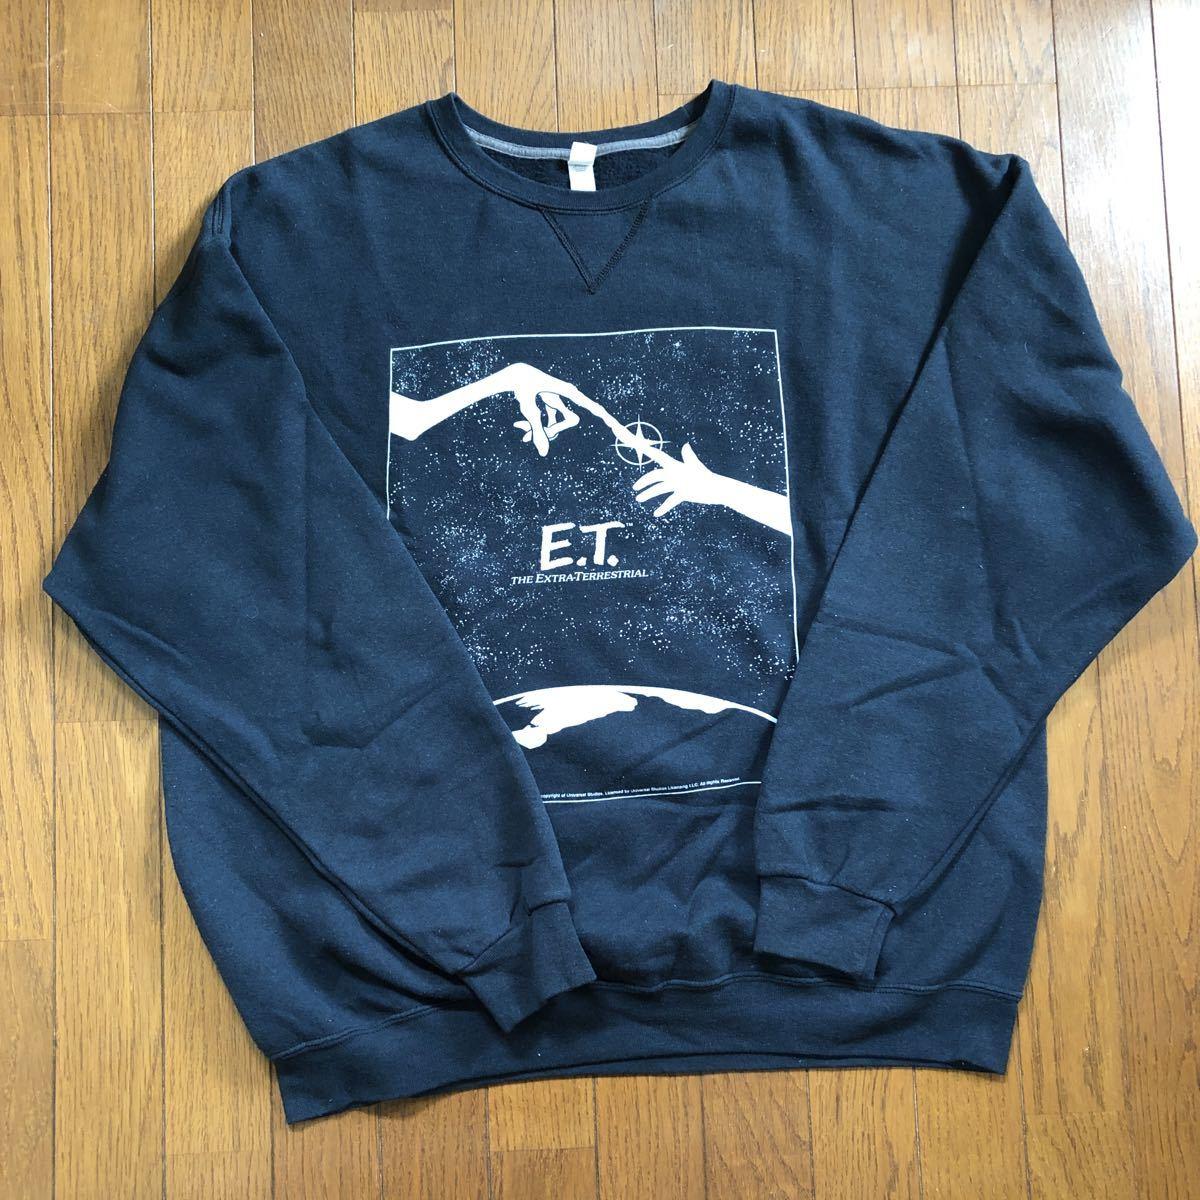 E.T. スウェットトレーナー XL ( FRUIT OF THE LOOM ) Vintage 映画 入手難 希少 薄手スウェット 春秋_画像1